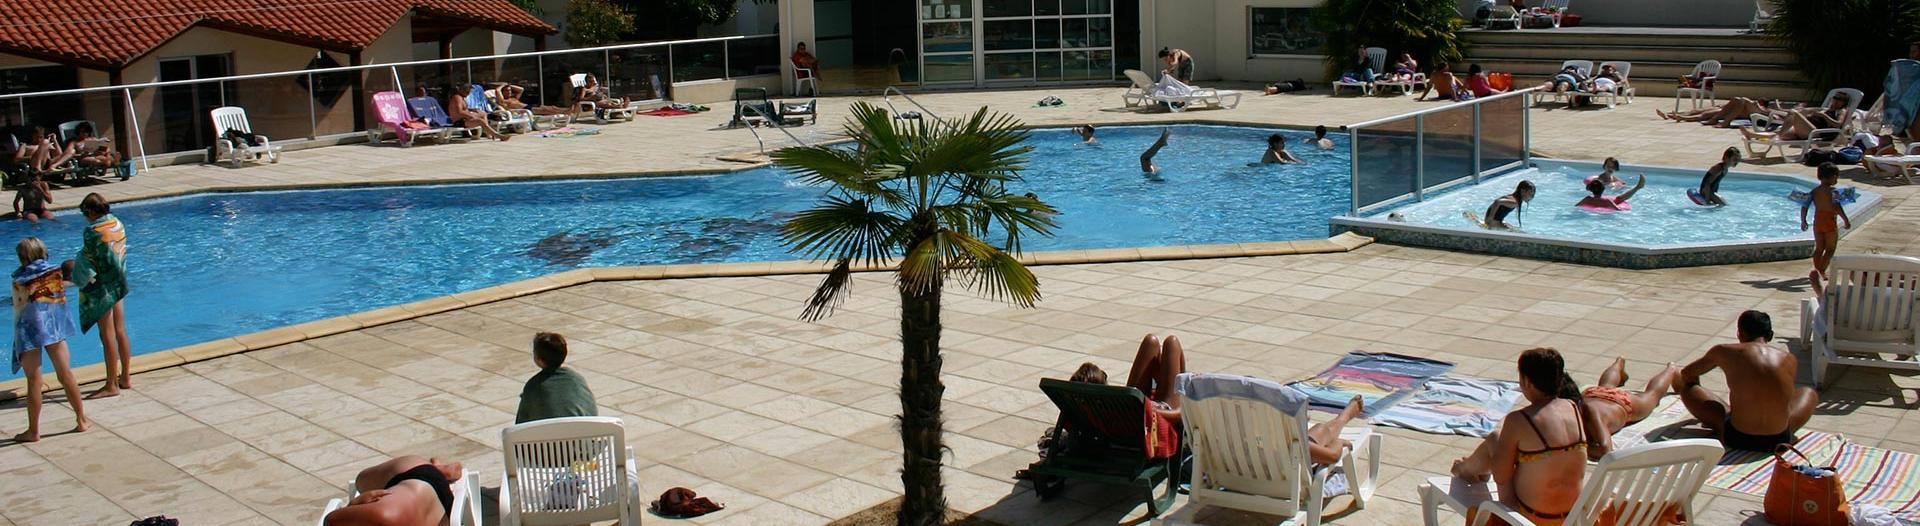 slider-camping-cypres-saint-gilles-vendee-bain-de-soleil